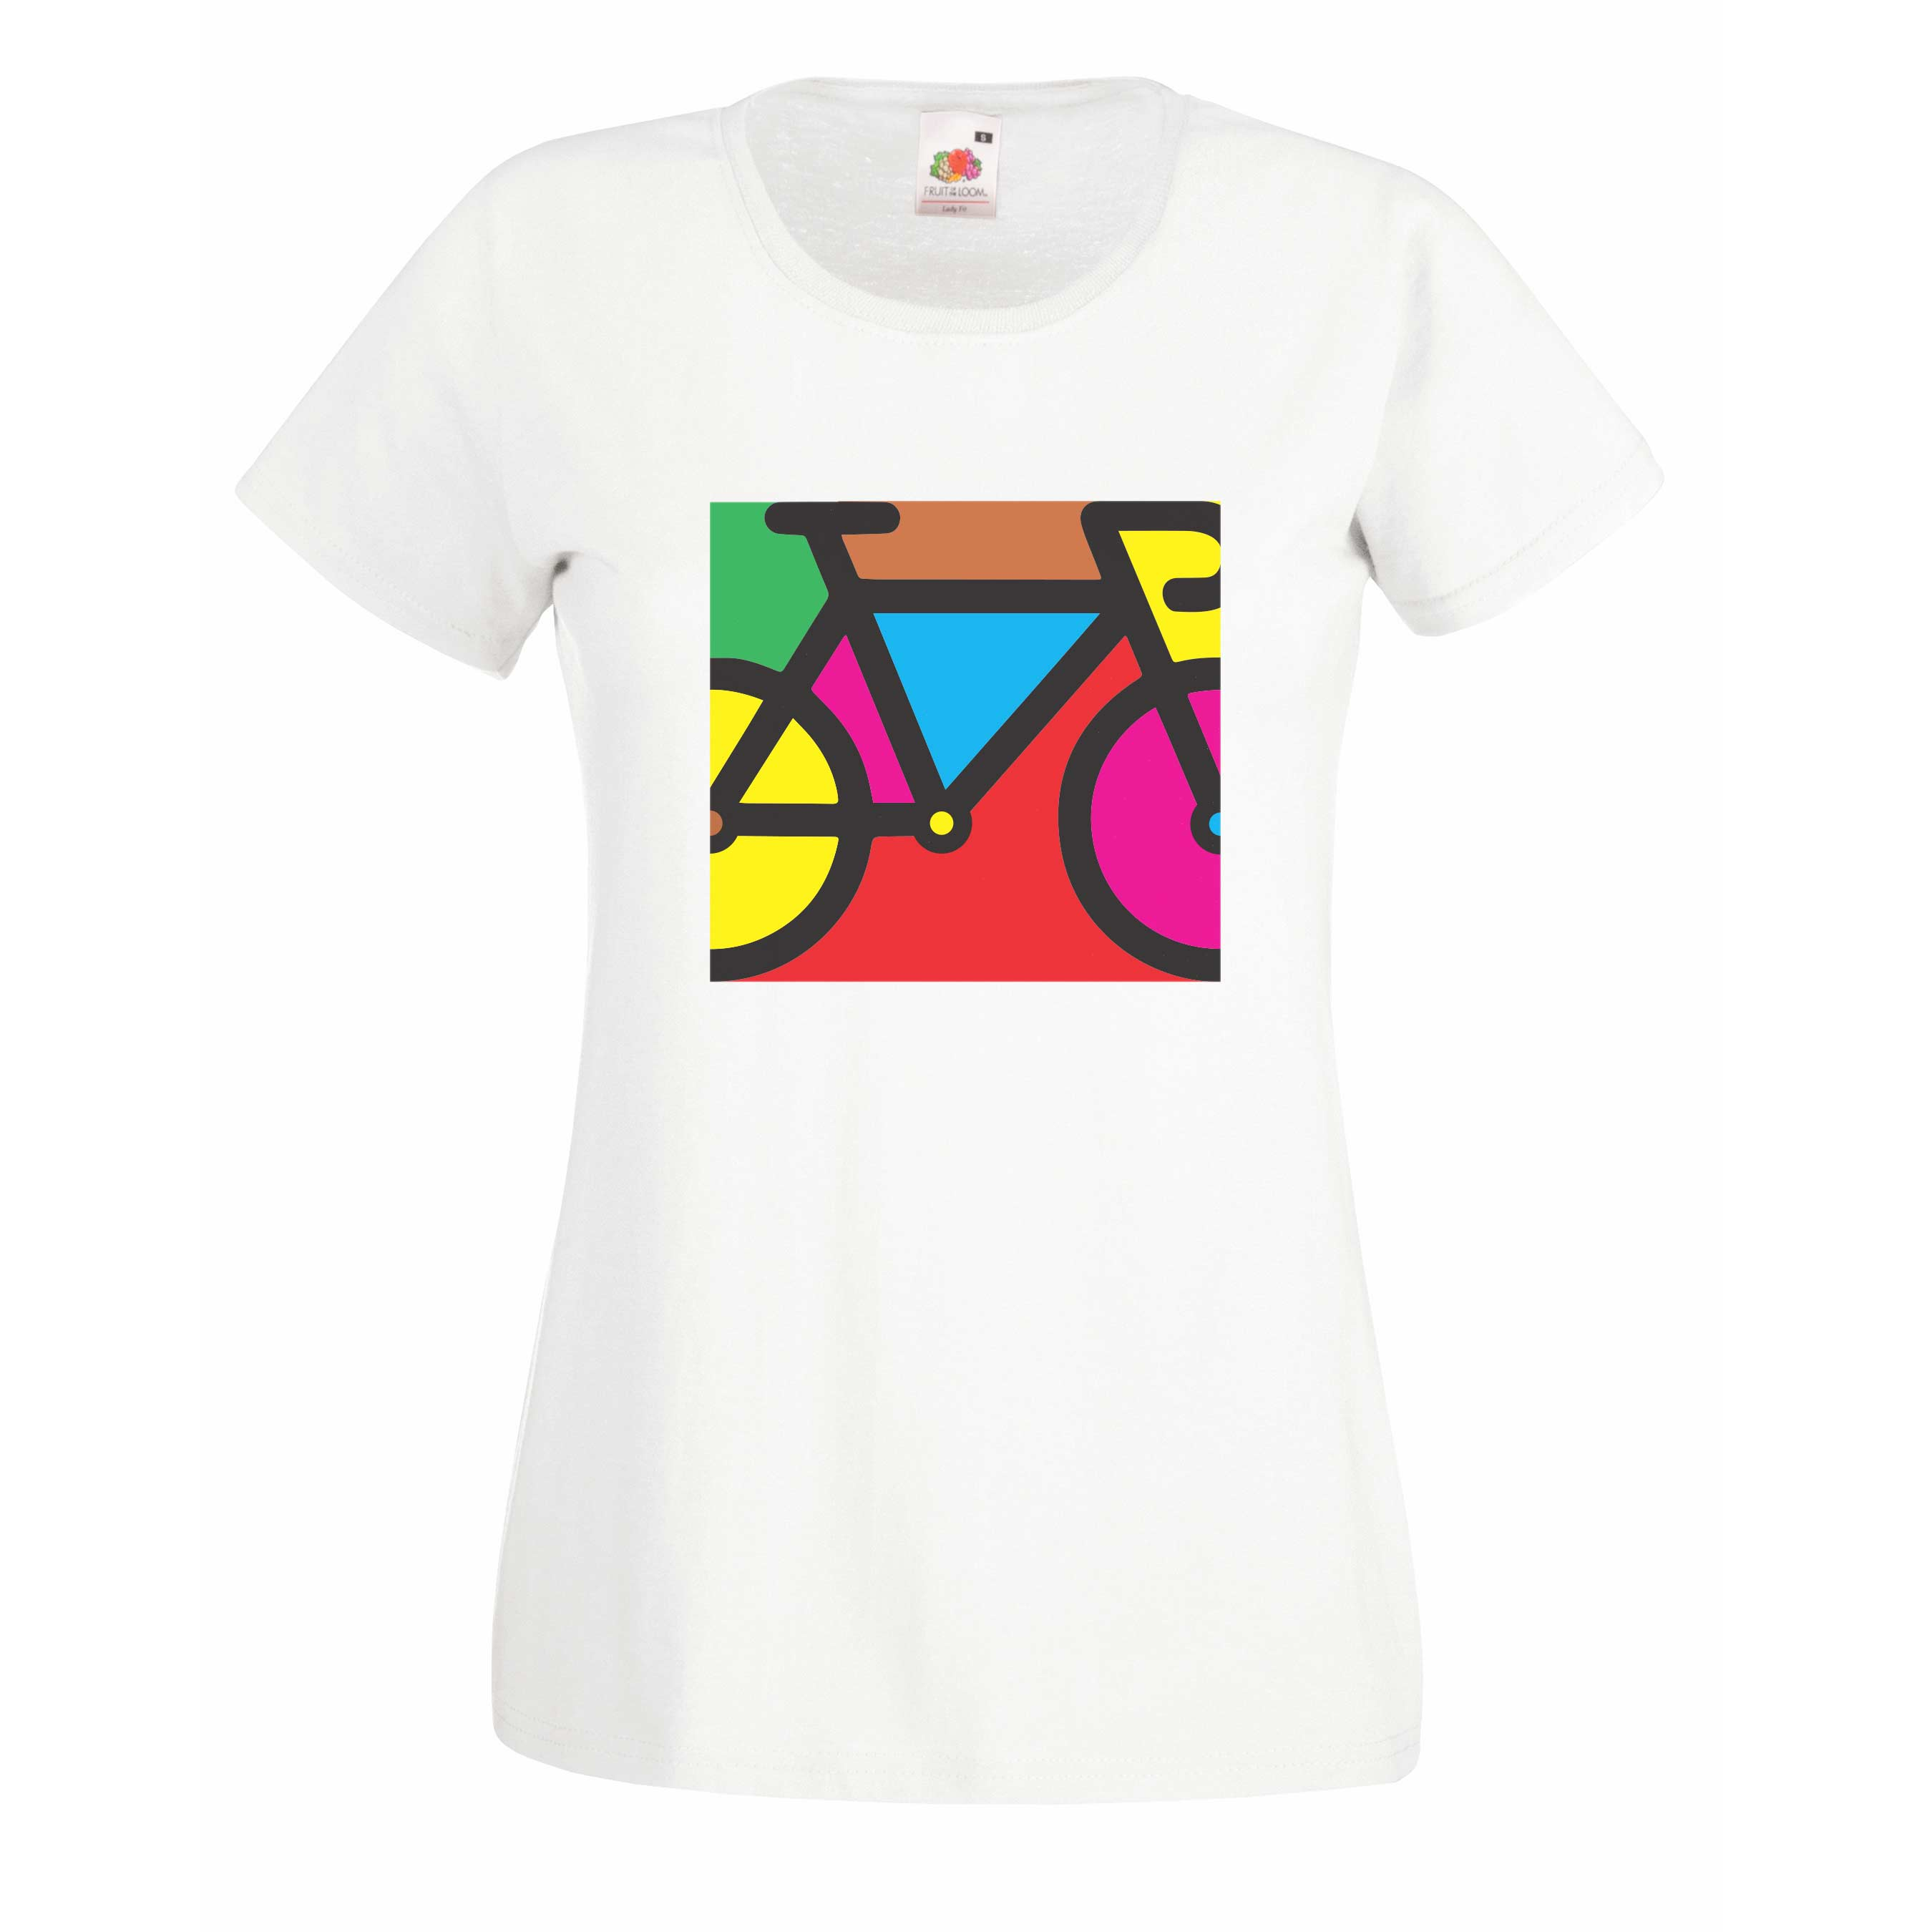 Mondrian design for t-shirt, hoodie & sweatshirt